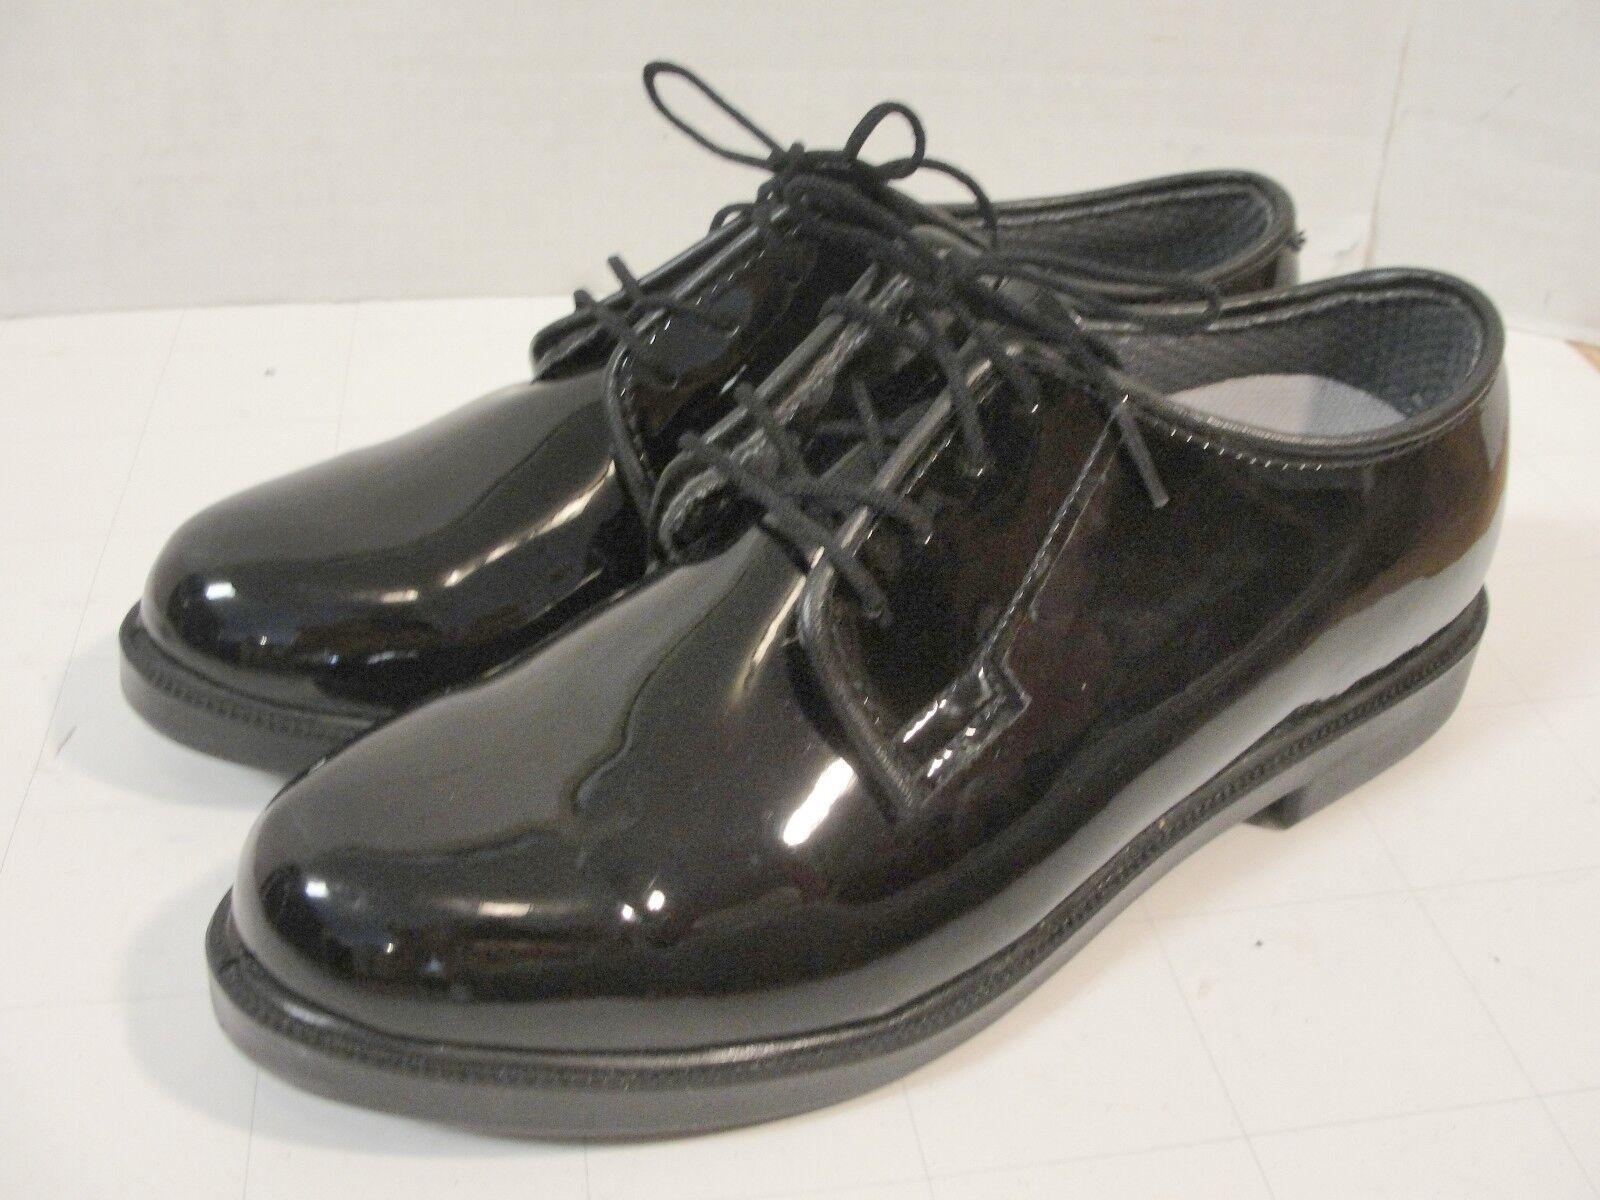 New Bates Durashocks Black Dress Shoes Patent Leather High Gloss Size 7 M 00742